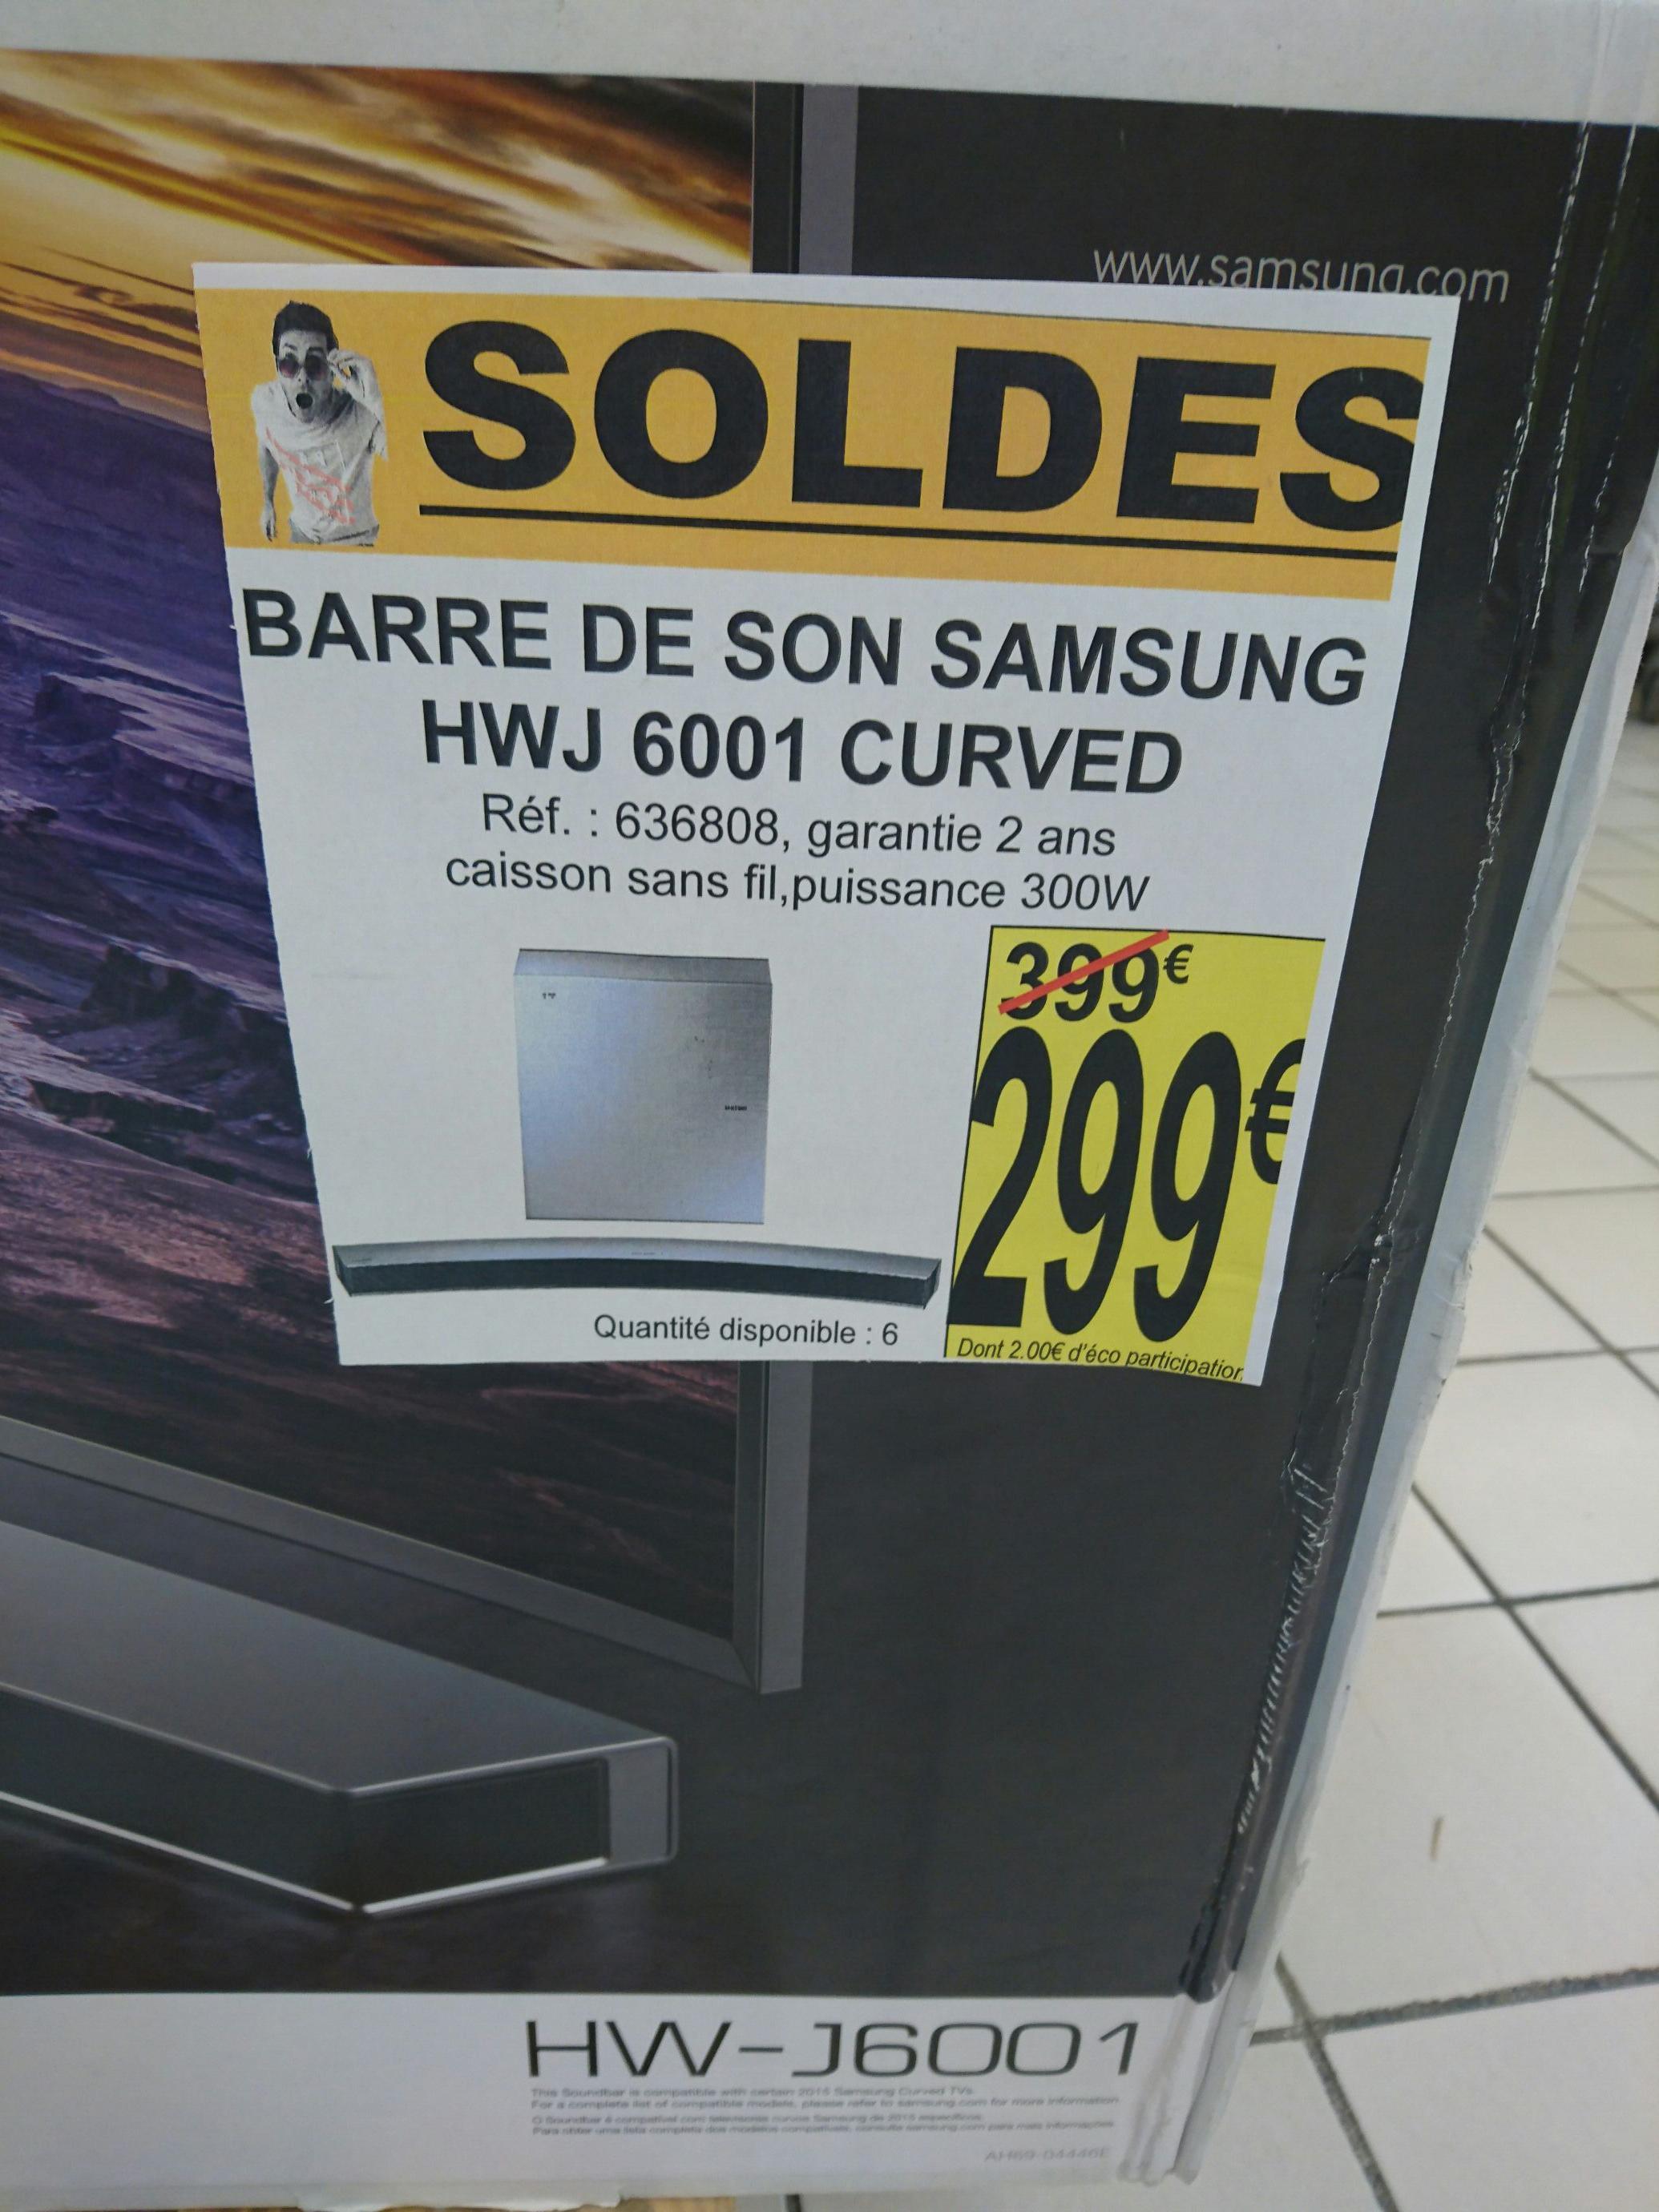 Barre de son Samsung HW-J6001 Curved (via ODR 30€)